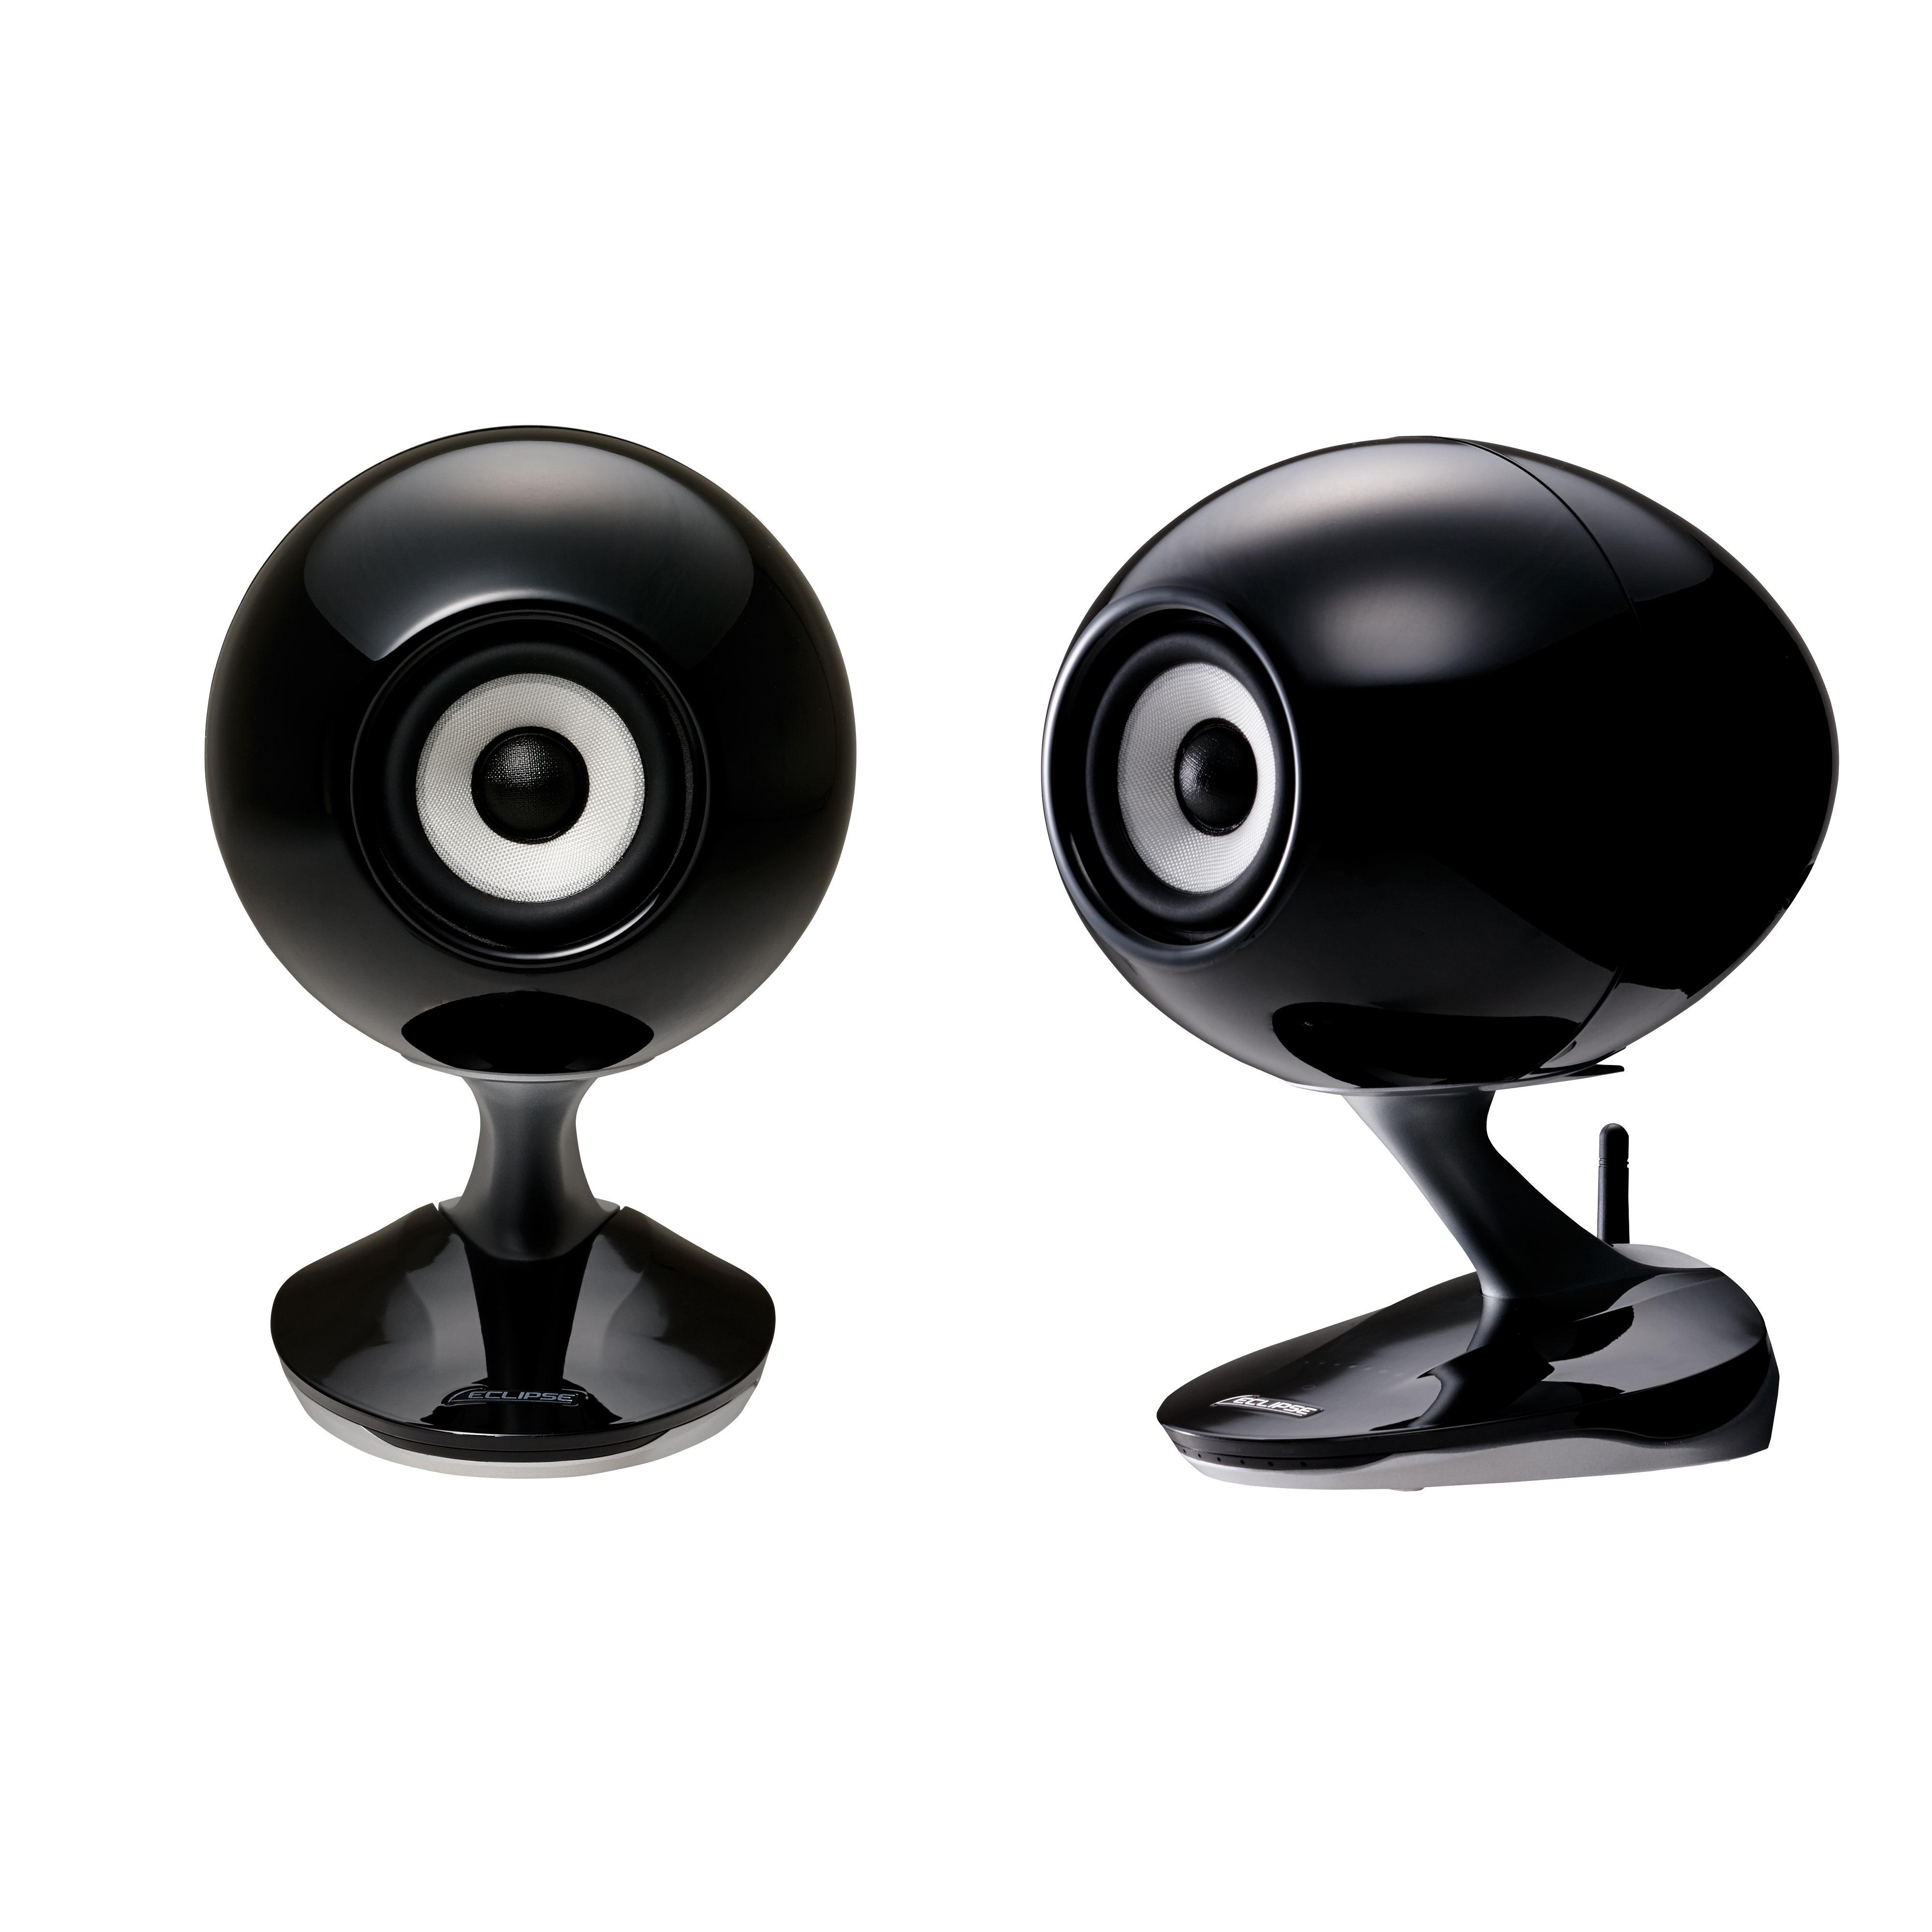 Head-Fi Buying Guide (Desktop & Portable Speakers) | Headphone